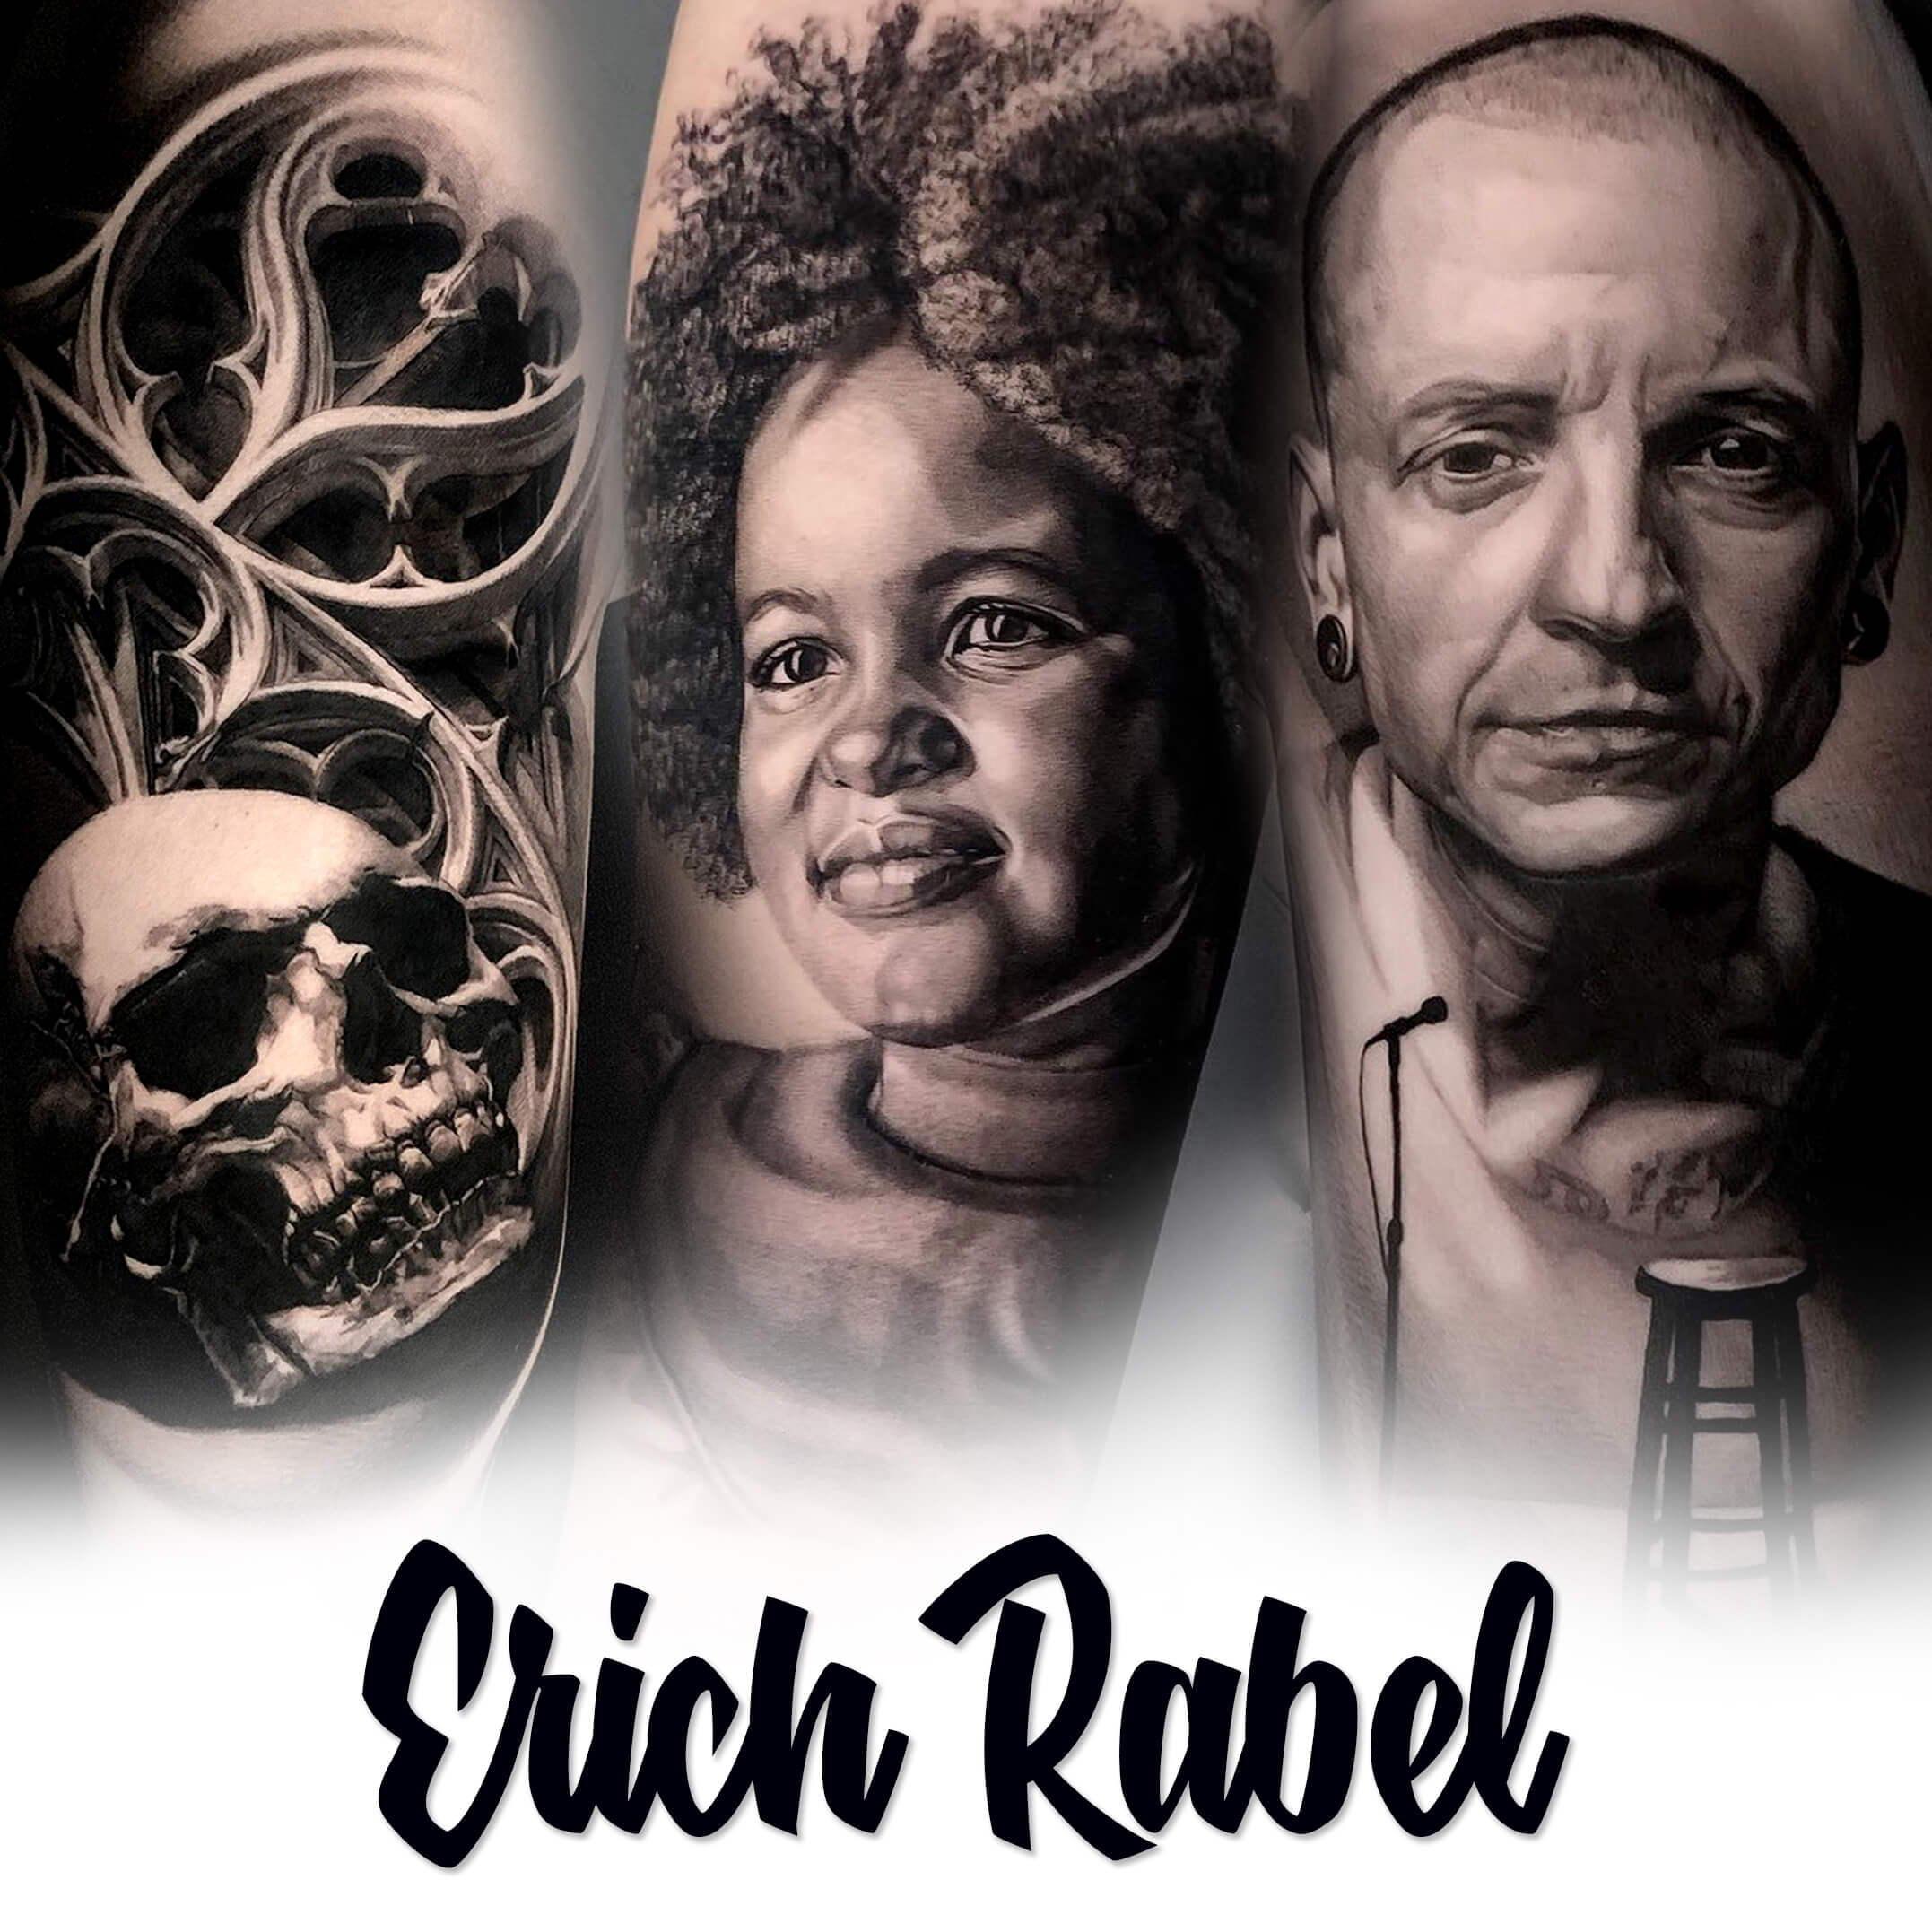 Erich Rabel Pro Series Set